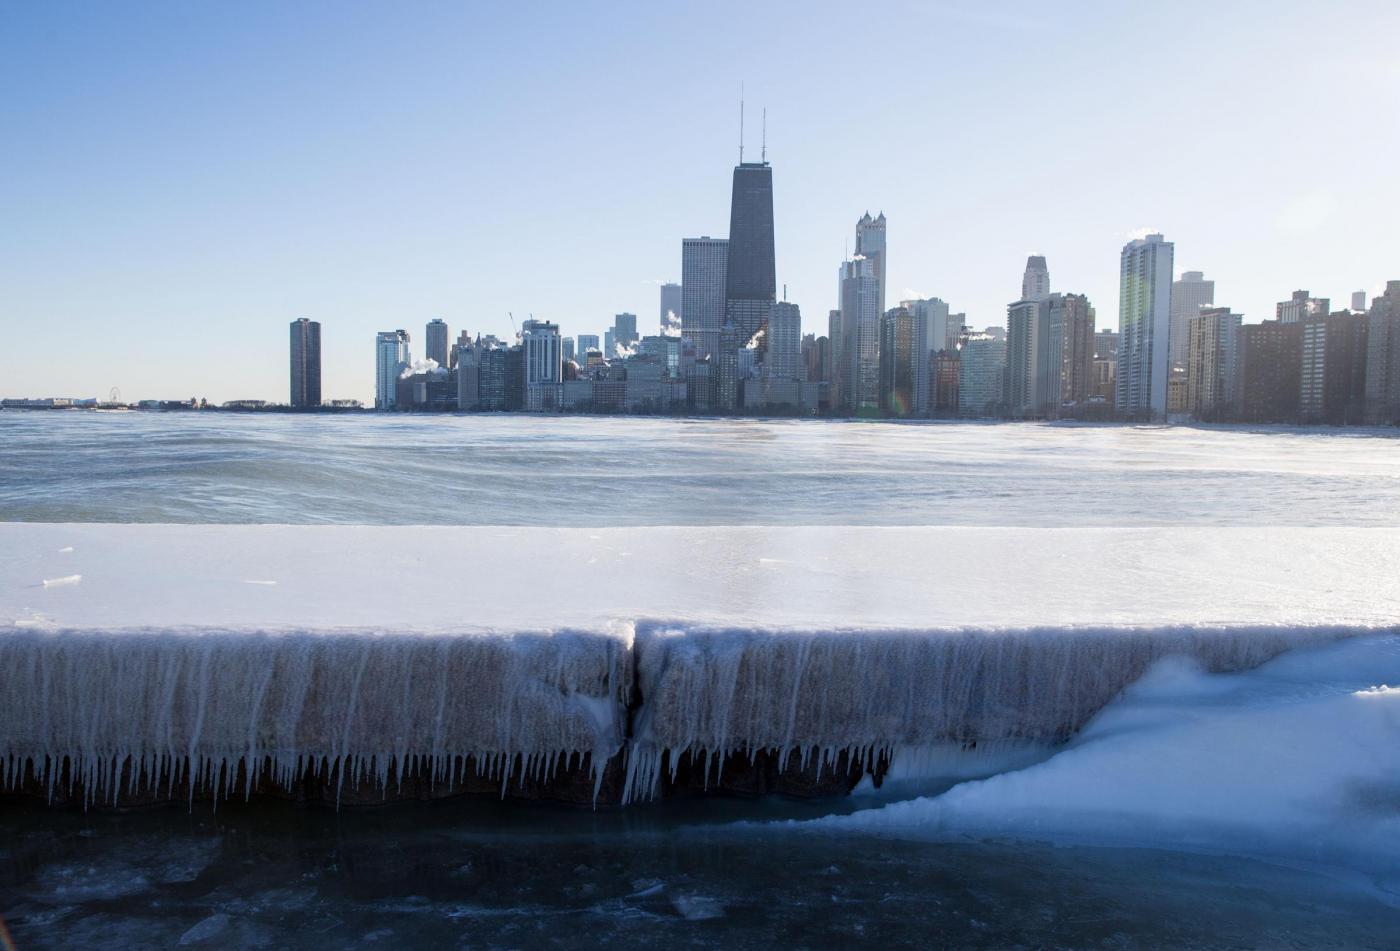 morsa gelo emergenza freddo usa generatori aria calda biemmedue gelo neve vento riscaldamento made in italy.jpg